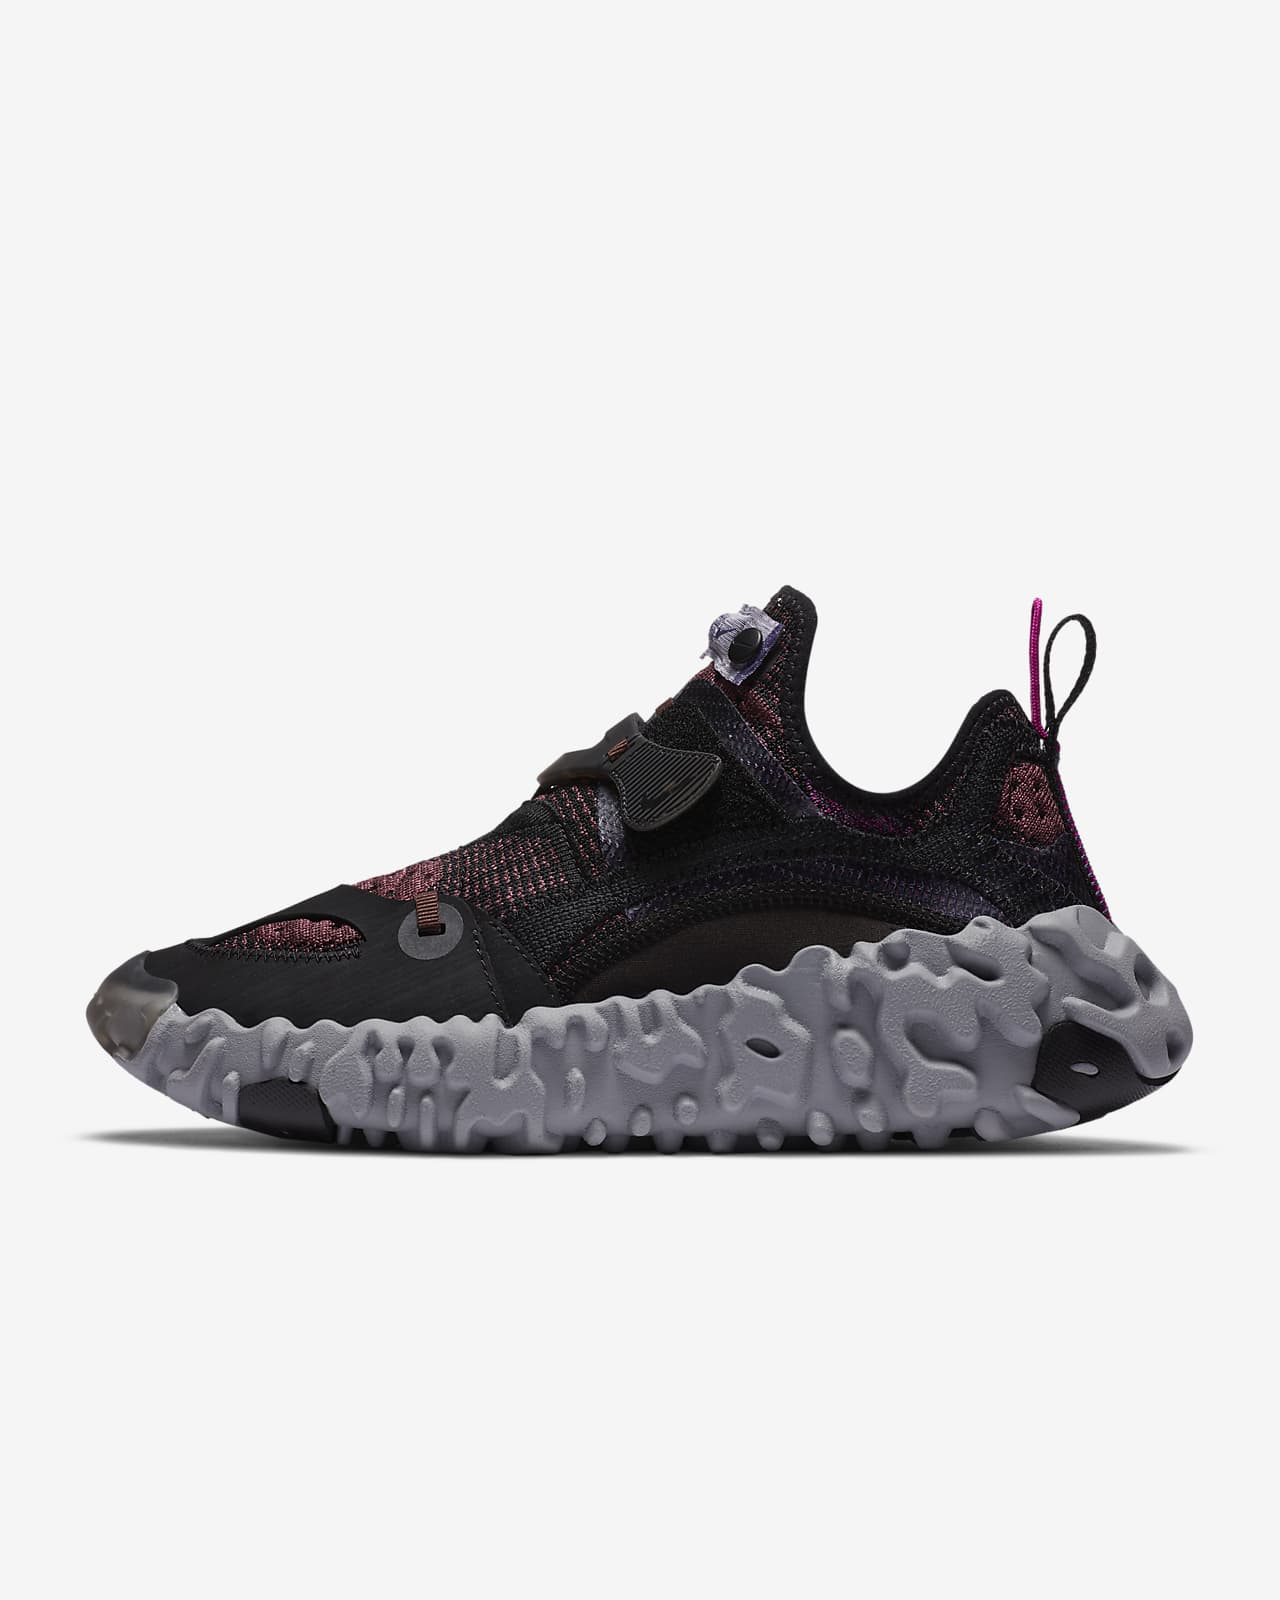 Nike OverReact FlyKnit ISPA 男子运动鞋